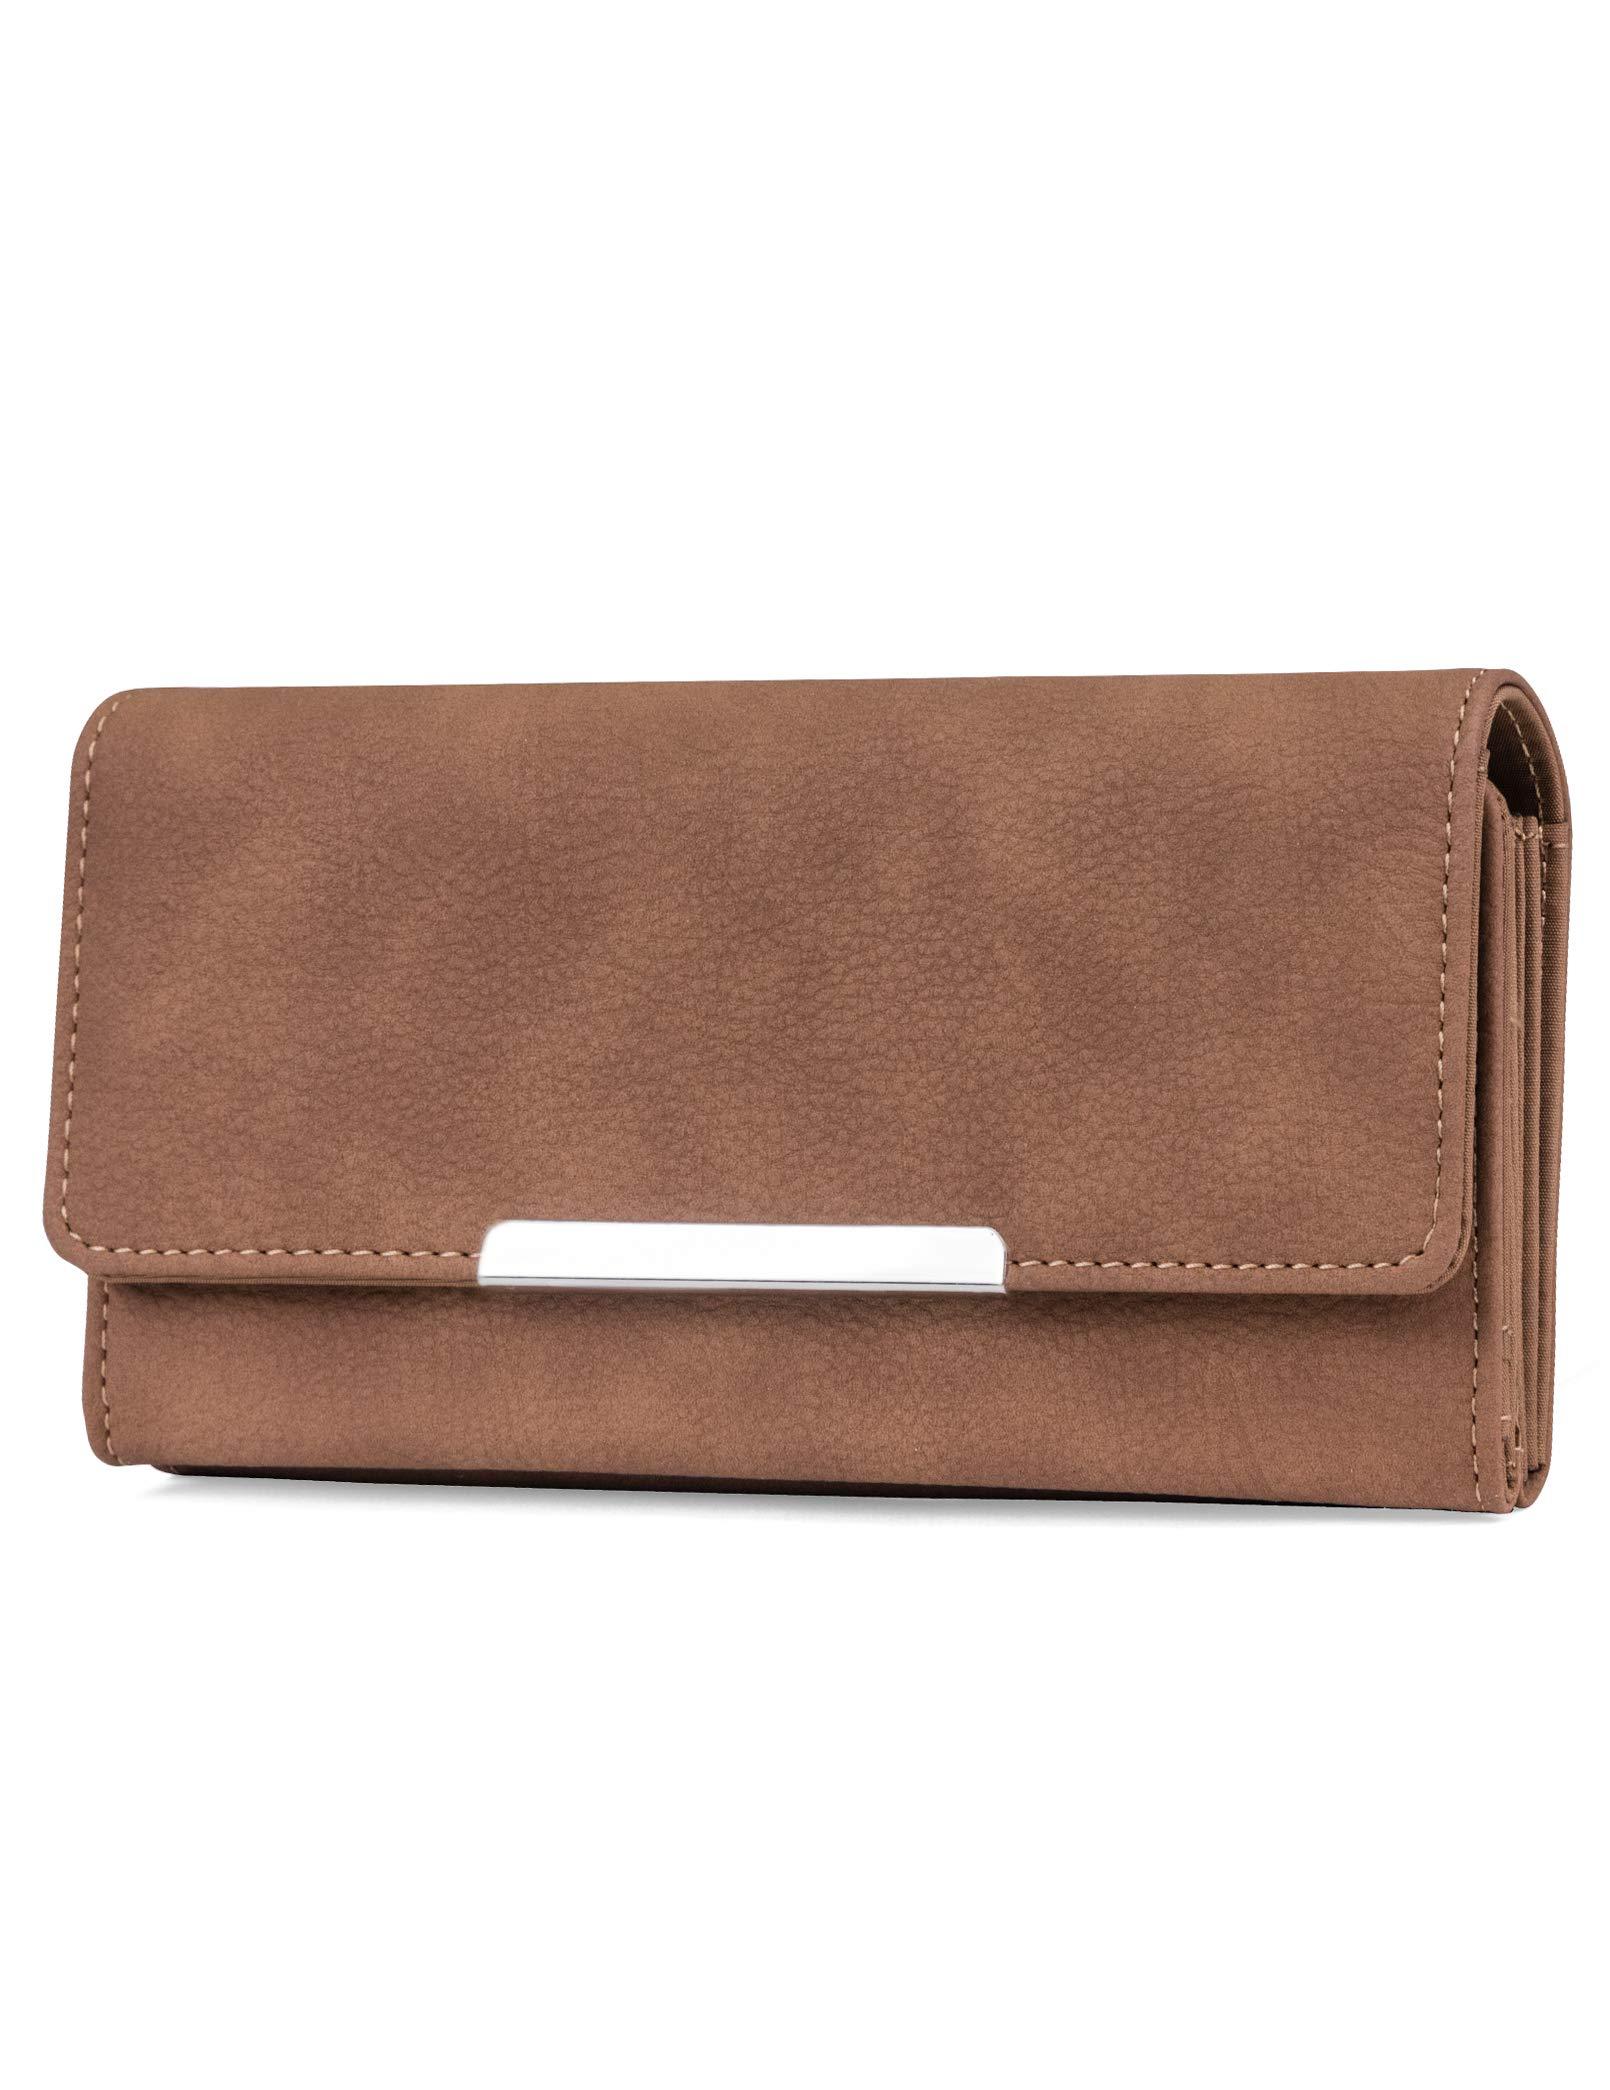 Mundi File Master Womens RFID Blocking Wallet Clutch Organizer With Change Pocket (One Size, (Brown Sugar)) by Mundi